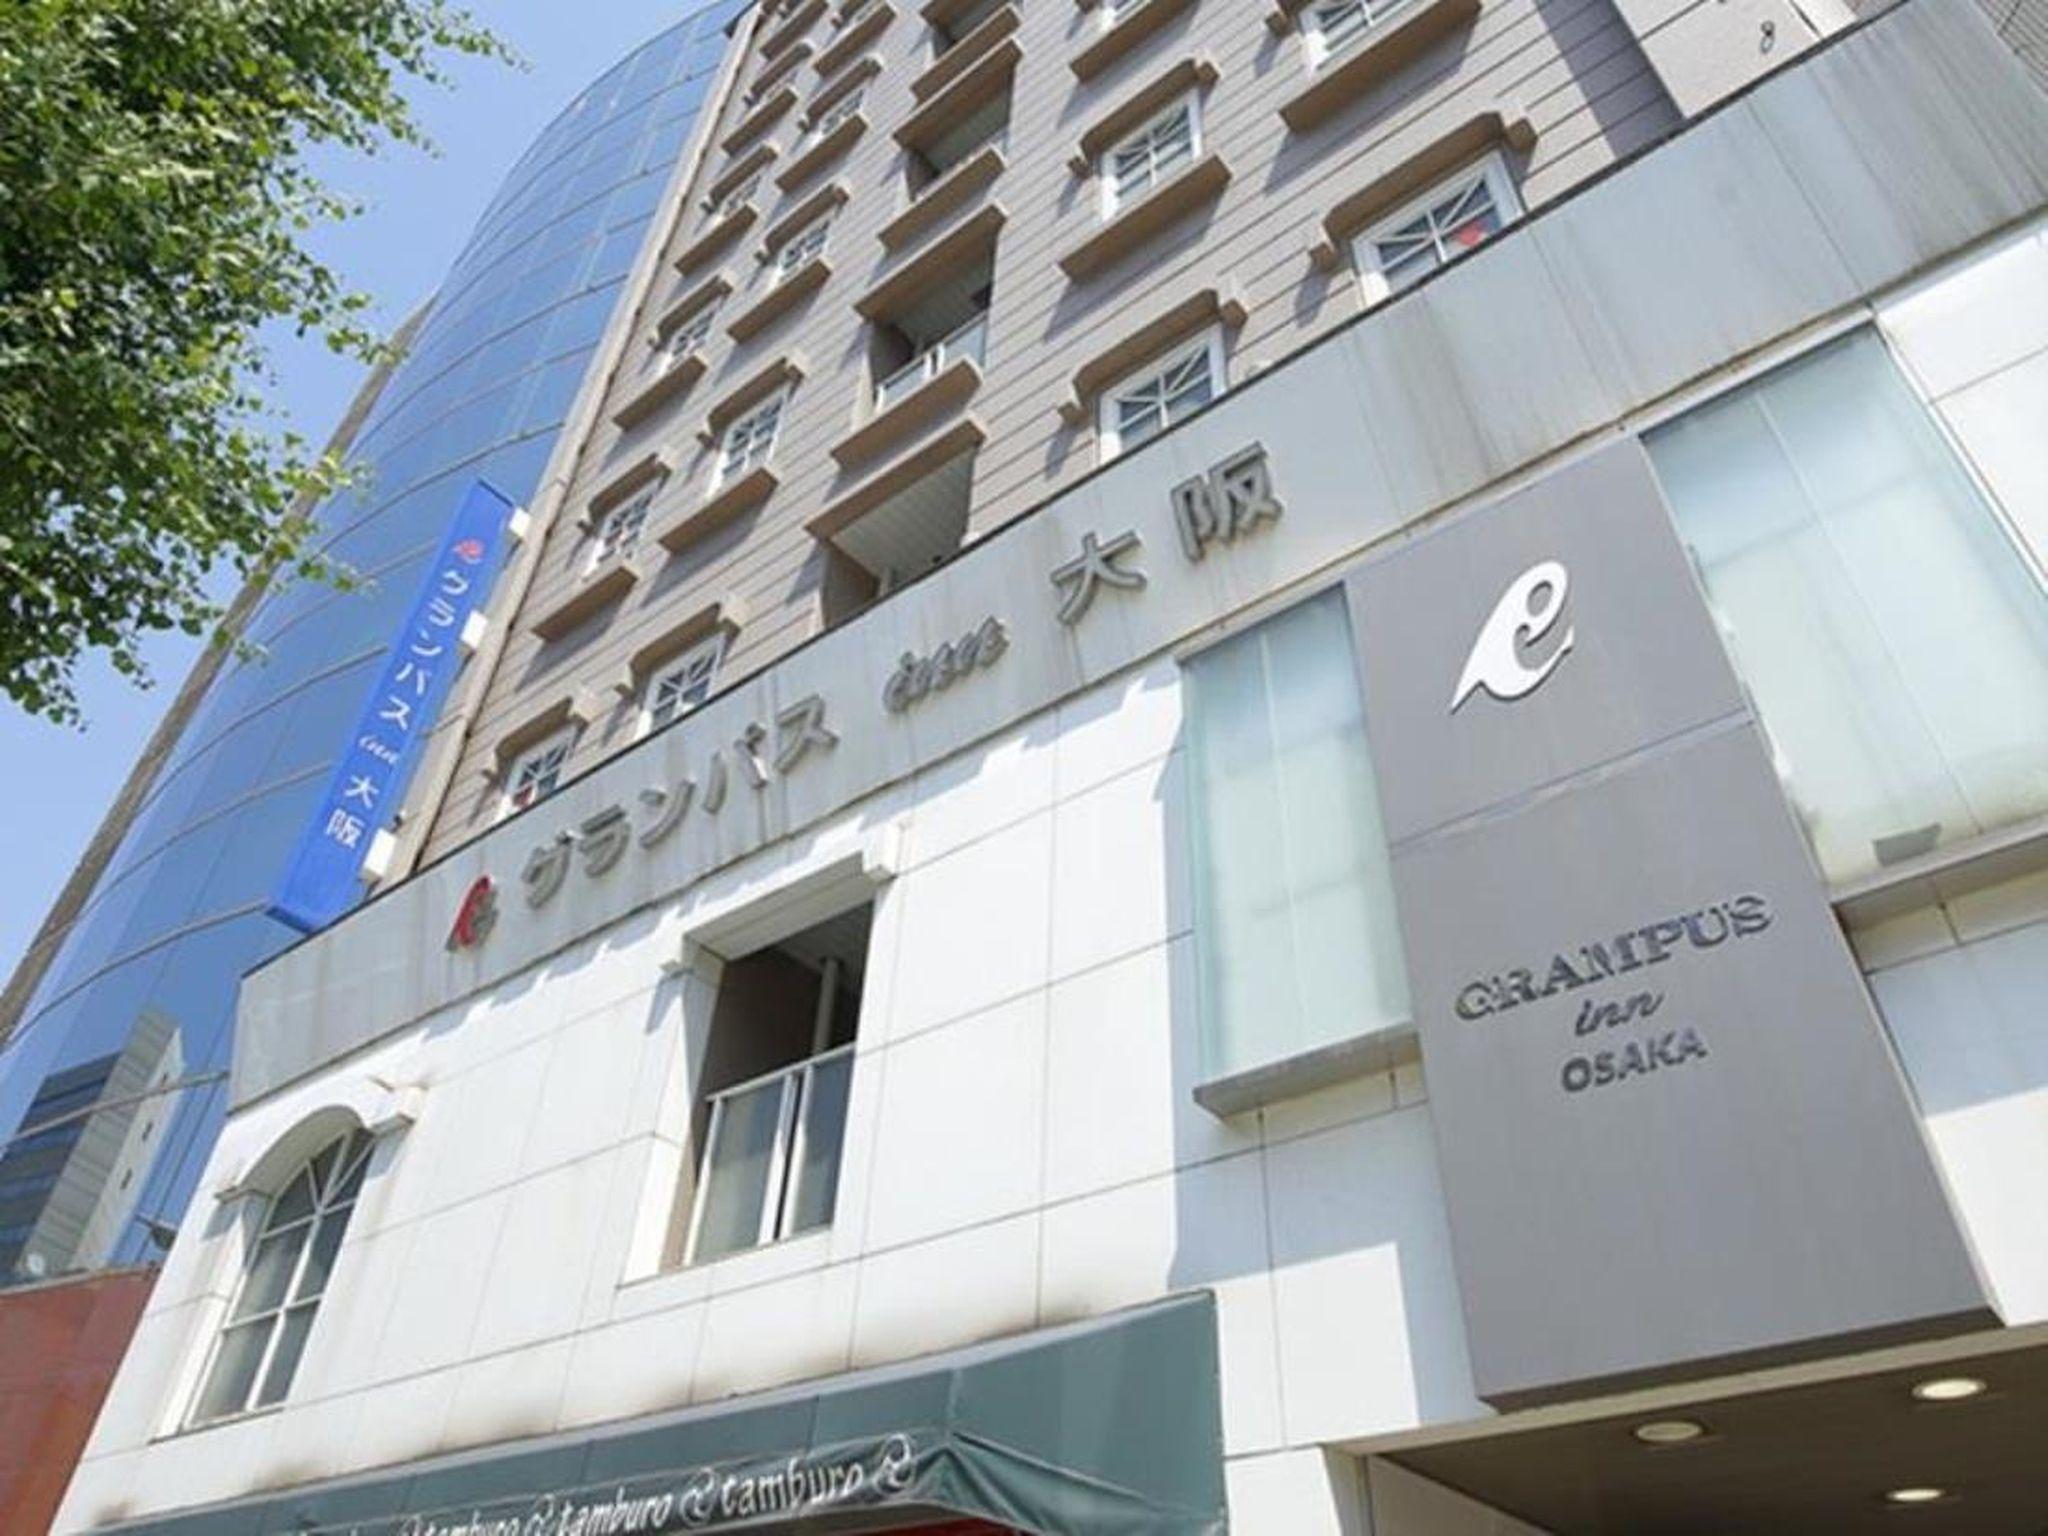 Grampus Inn Osaka Jepang Mulai Dari Rp 411336 Agoda Com